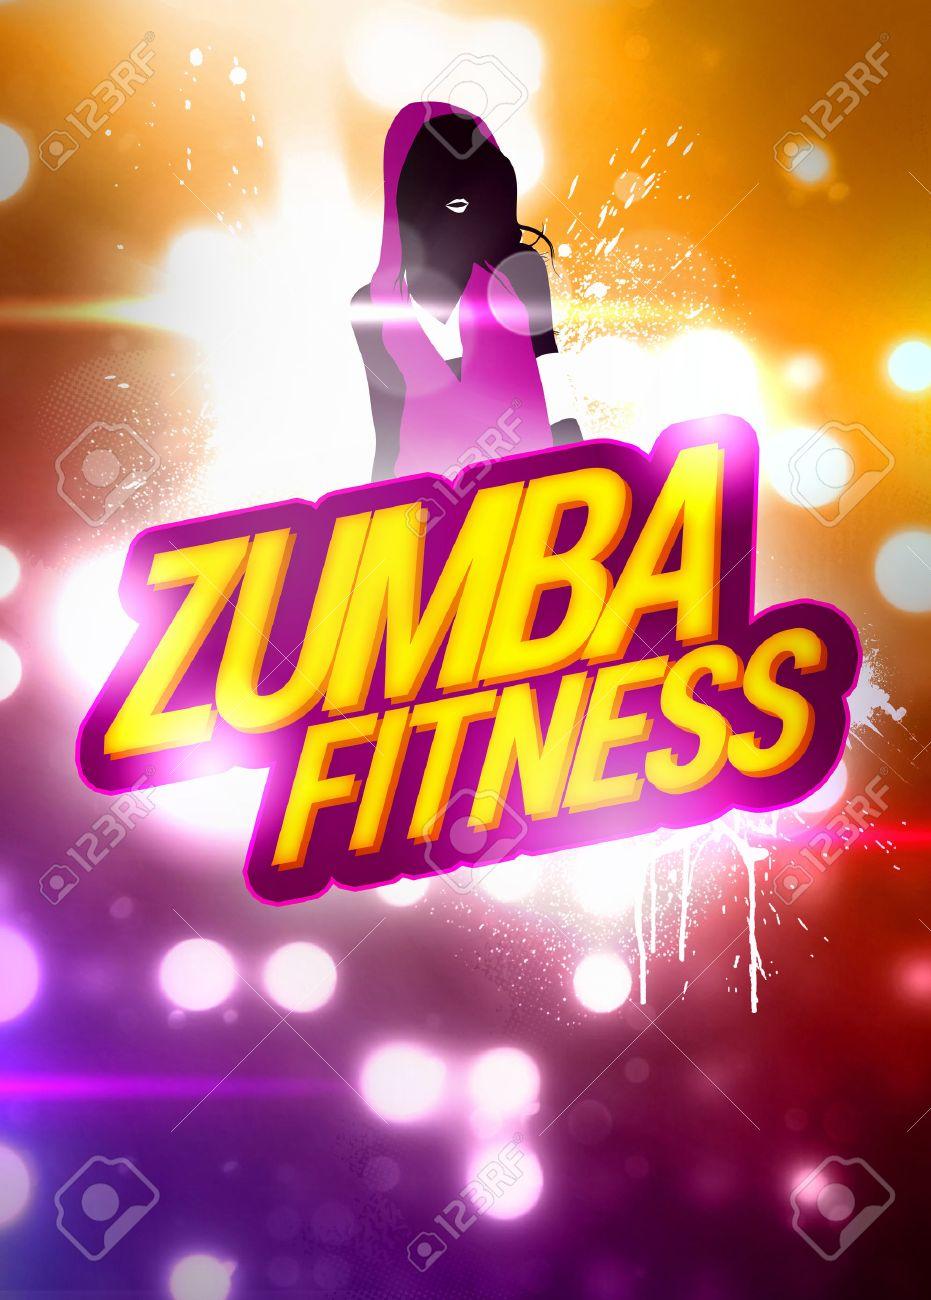 Zumba Fitness Training Invitation Advert Background With Empty